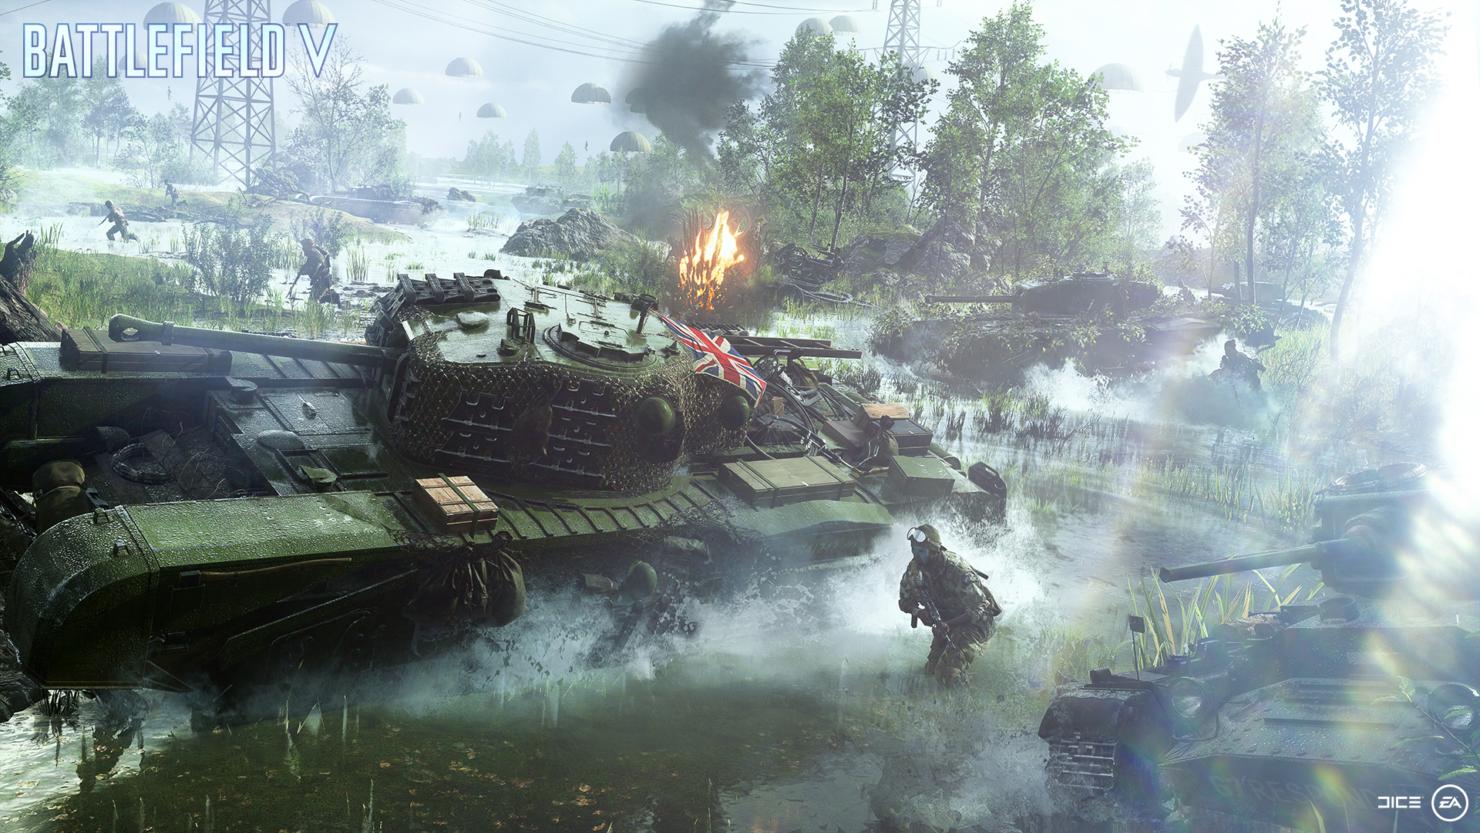 battlefield-v-reveal-screenshot-012